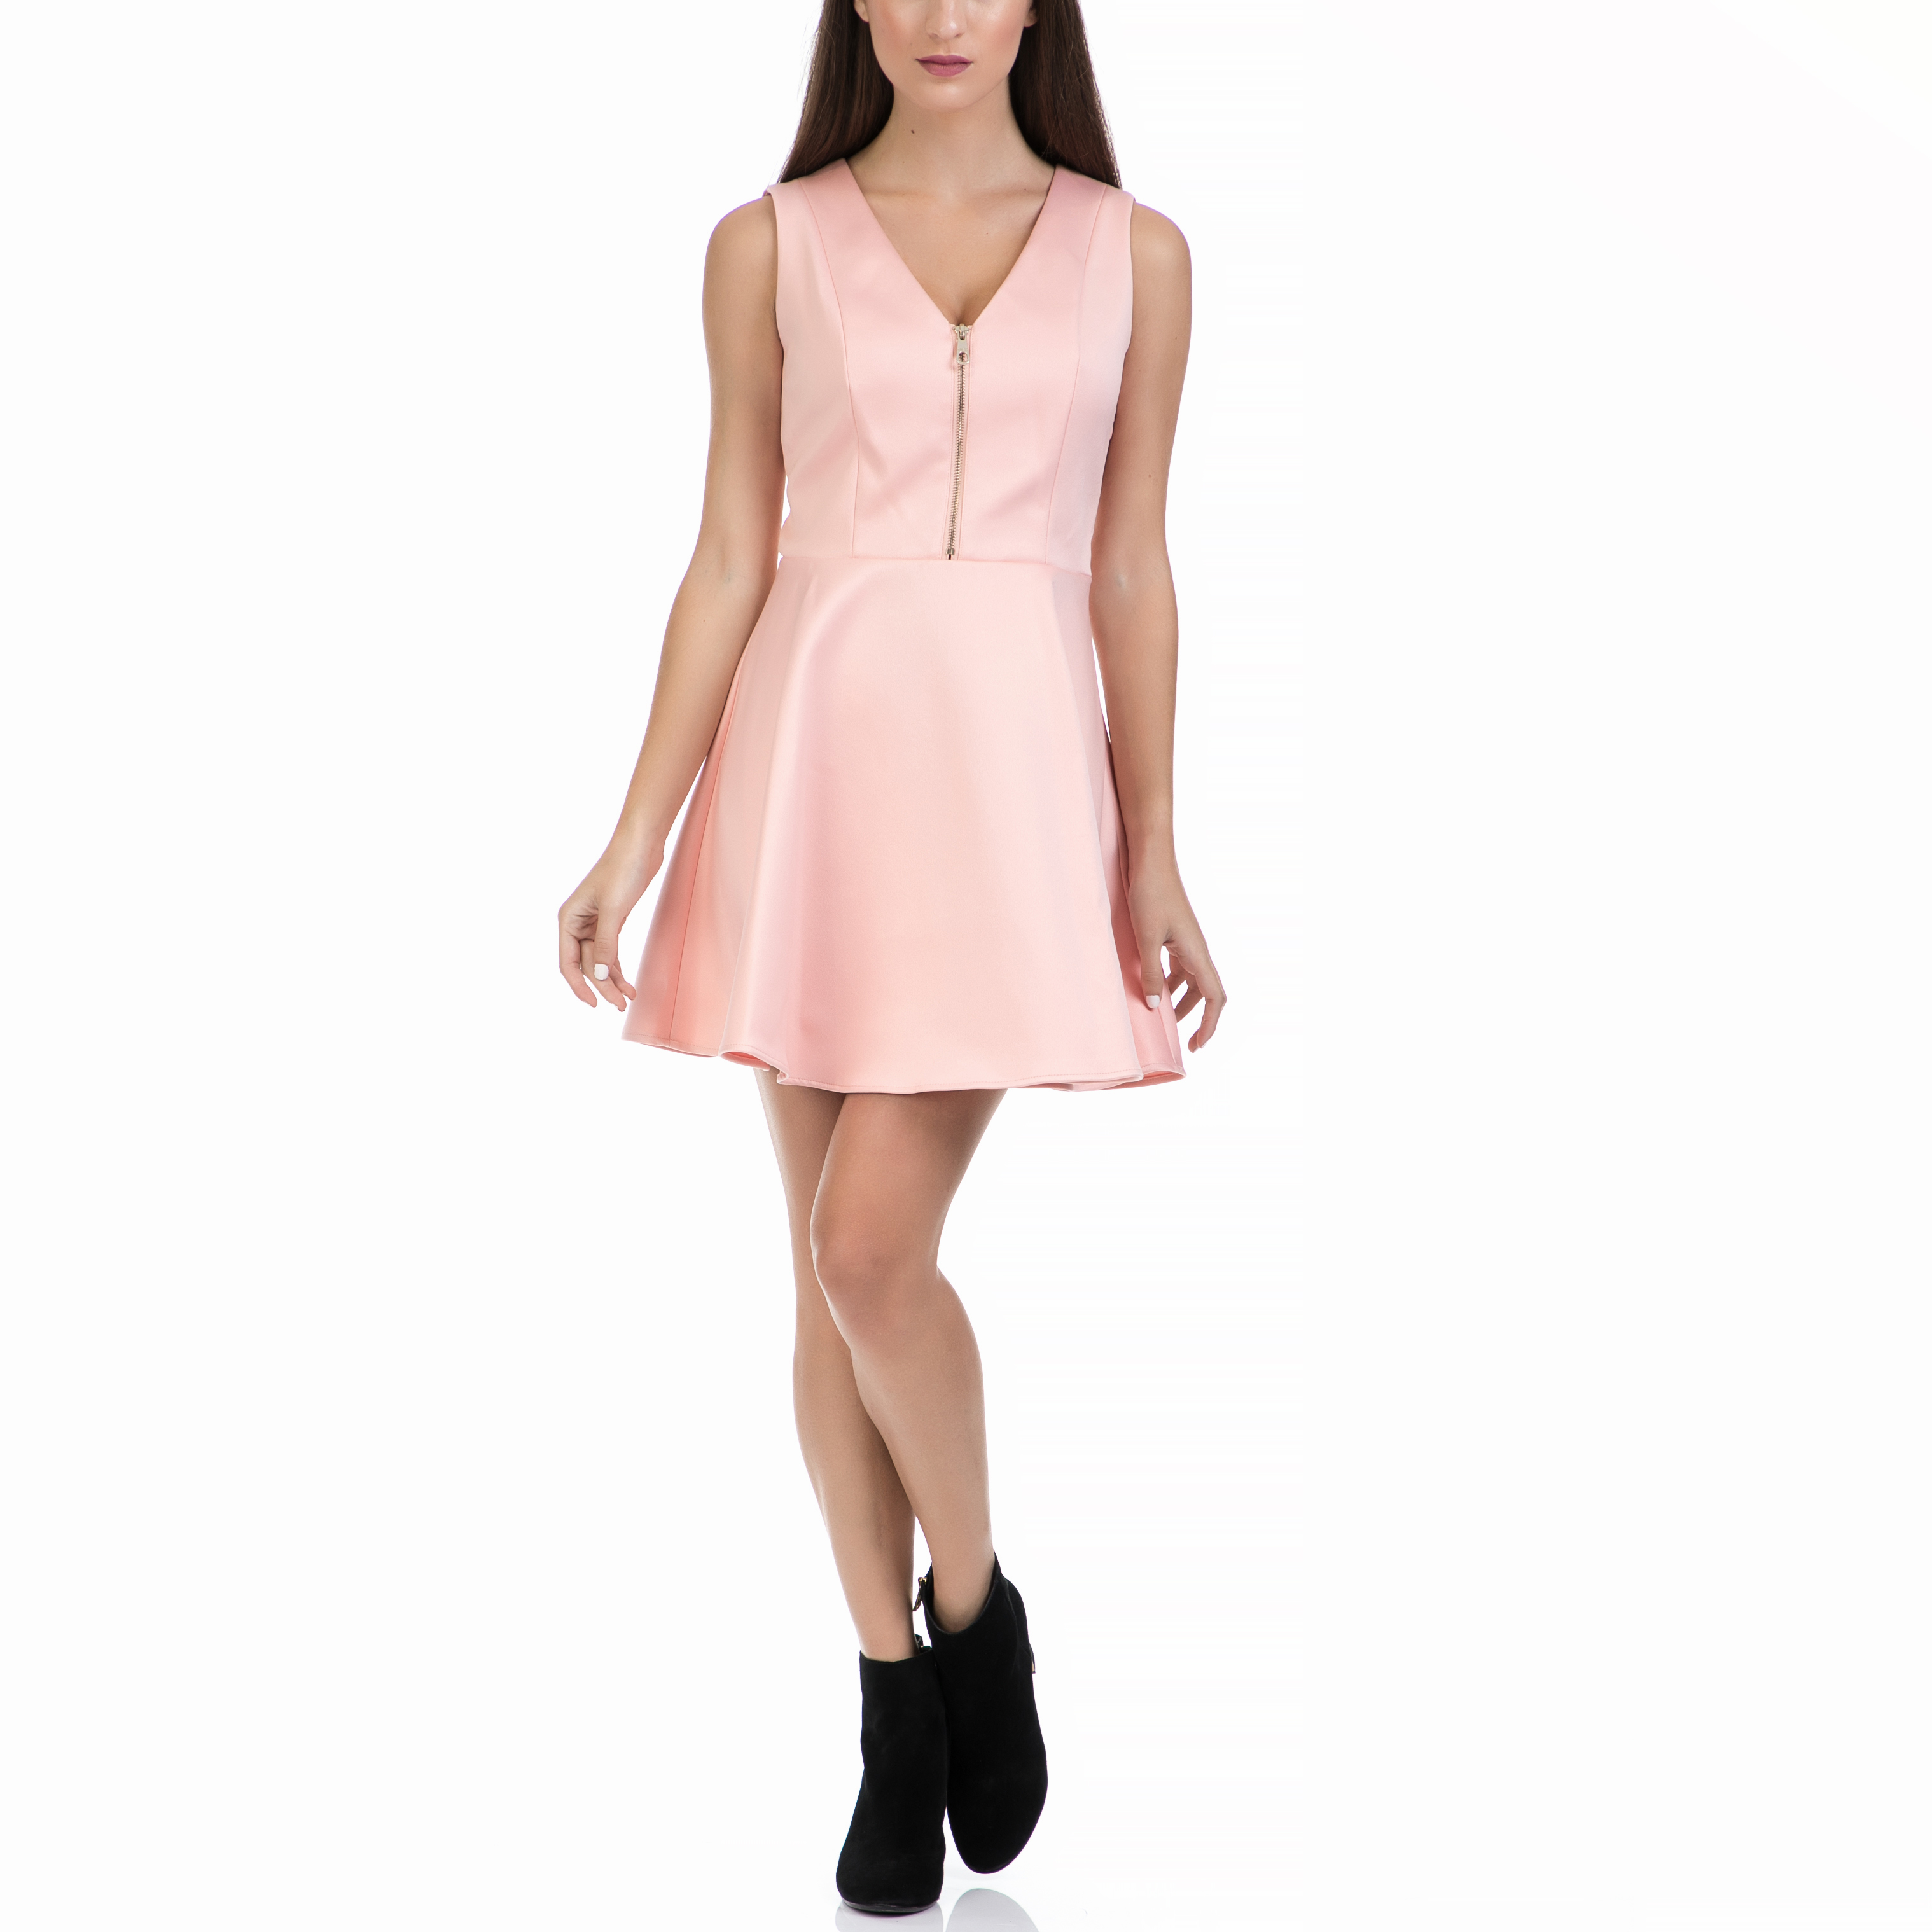 GUESS - Γυναικείο φόρεμα GUESS ροζ γυναικεία ρούχα φορέματα μίνι